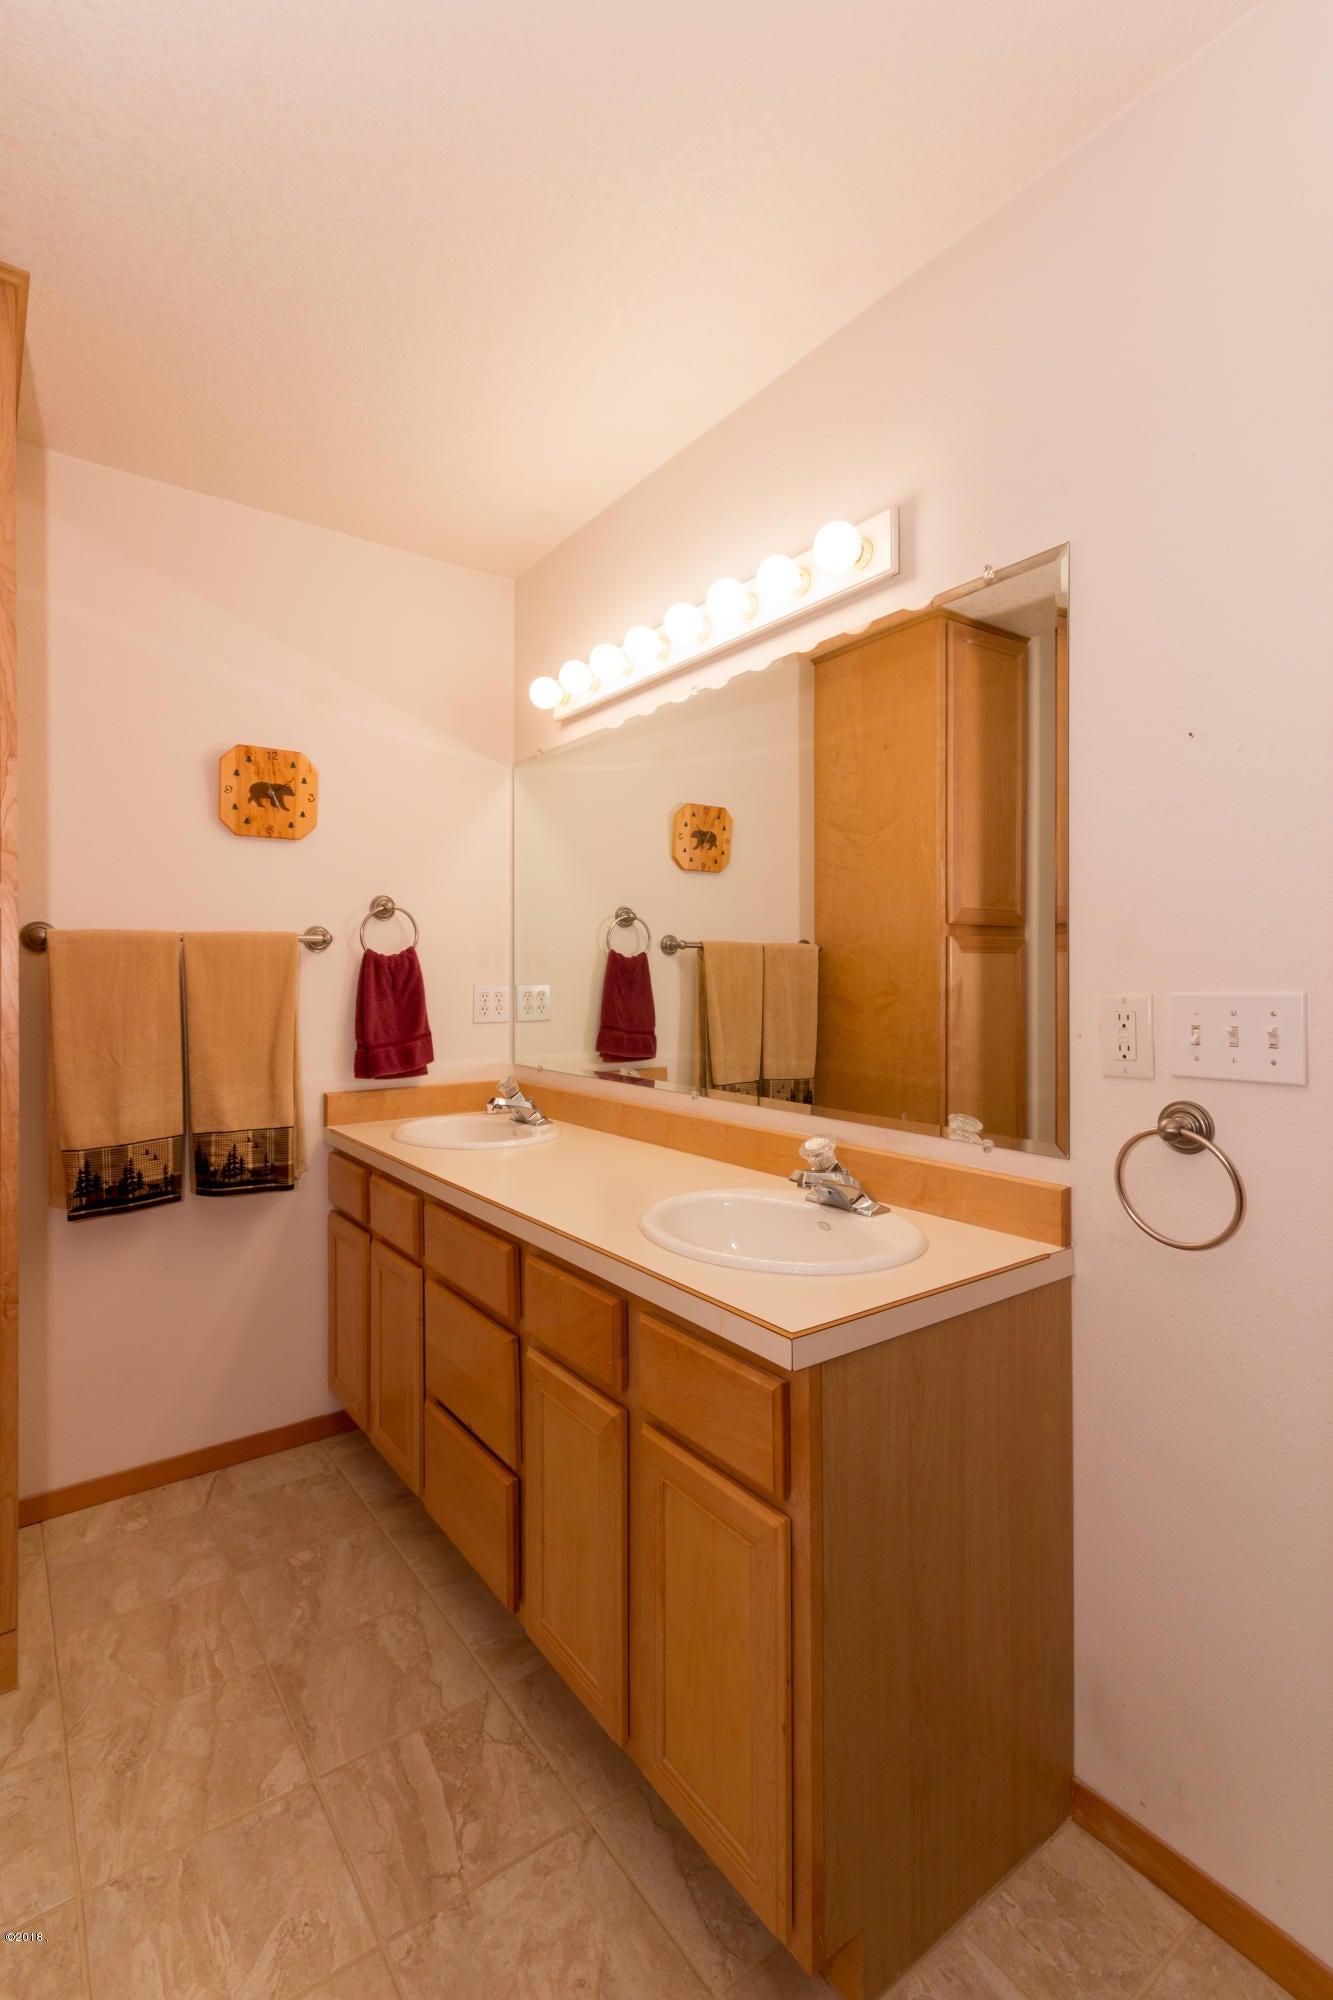 11 - Dual Vanities in Master Bath